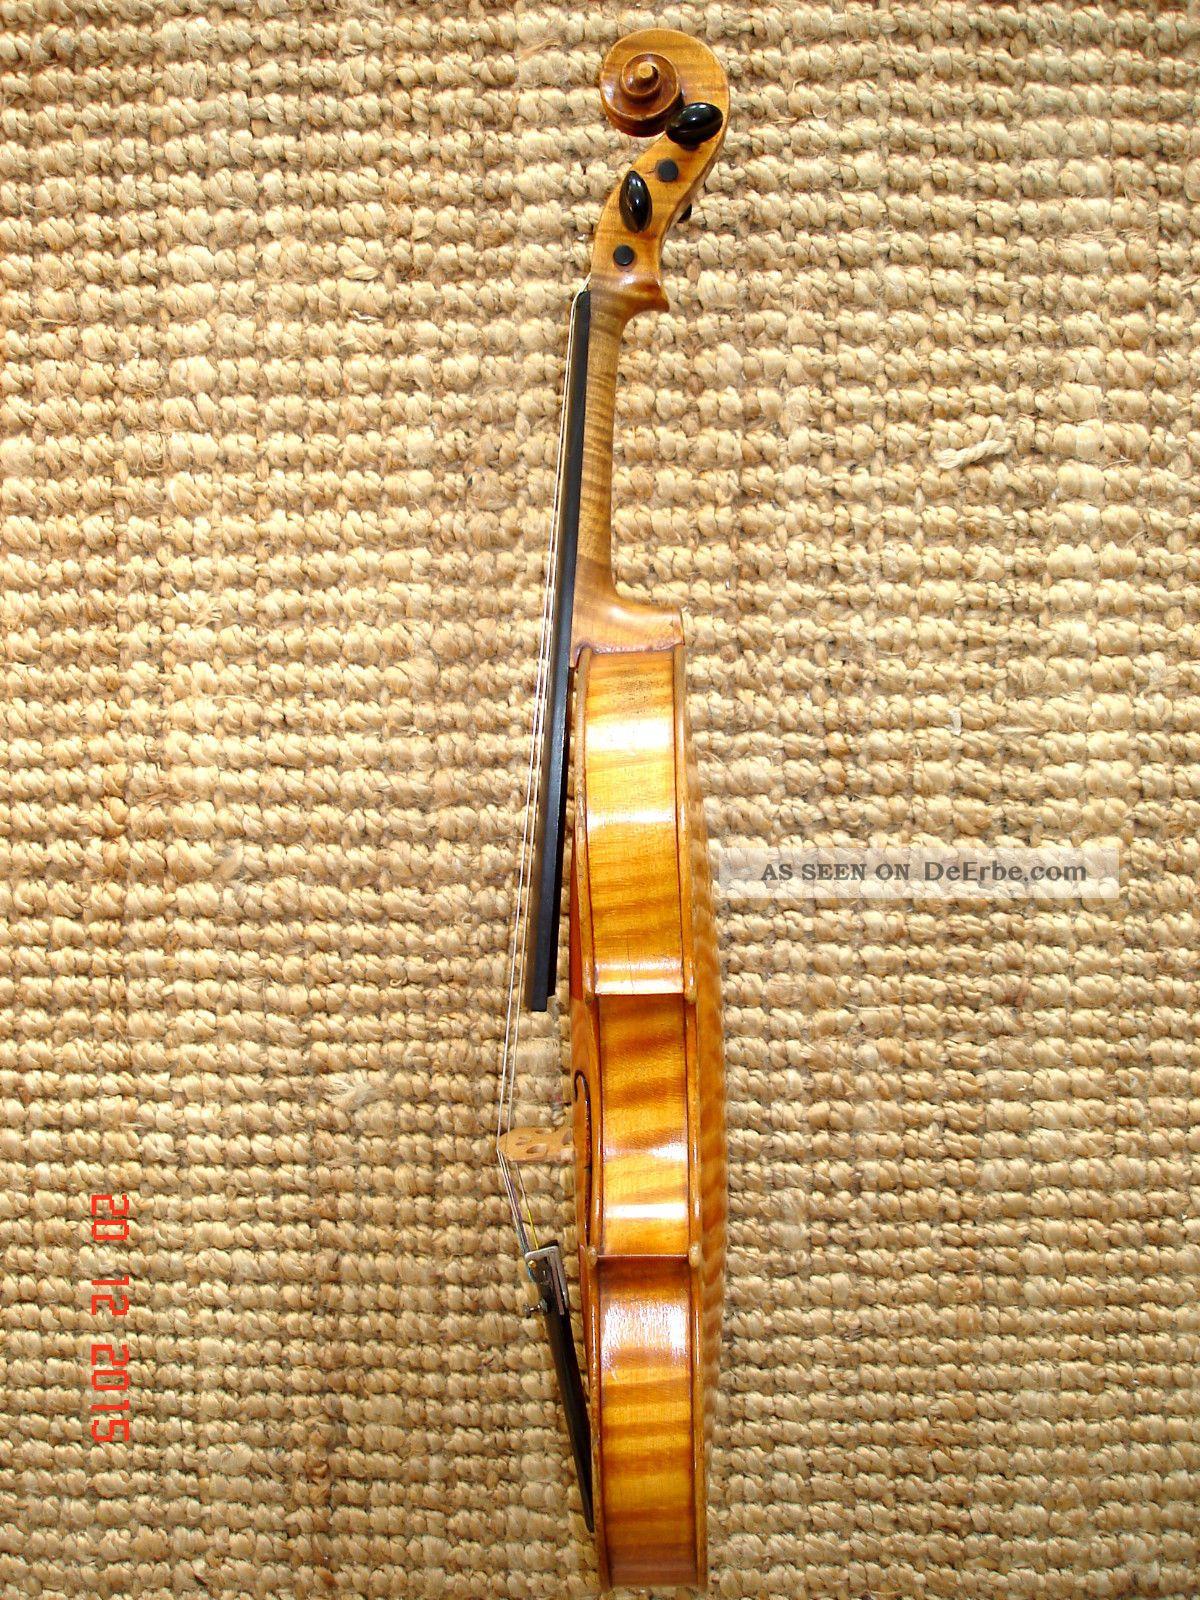 4/4 Violine Geige Carl Gottlob Schuster Jun.  Brandst.  Klang Sofort Spielb. Musikinstrumente Bild